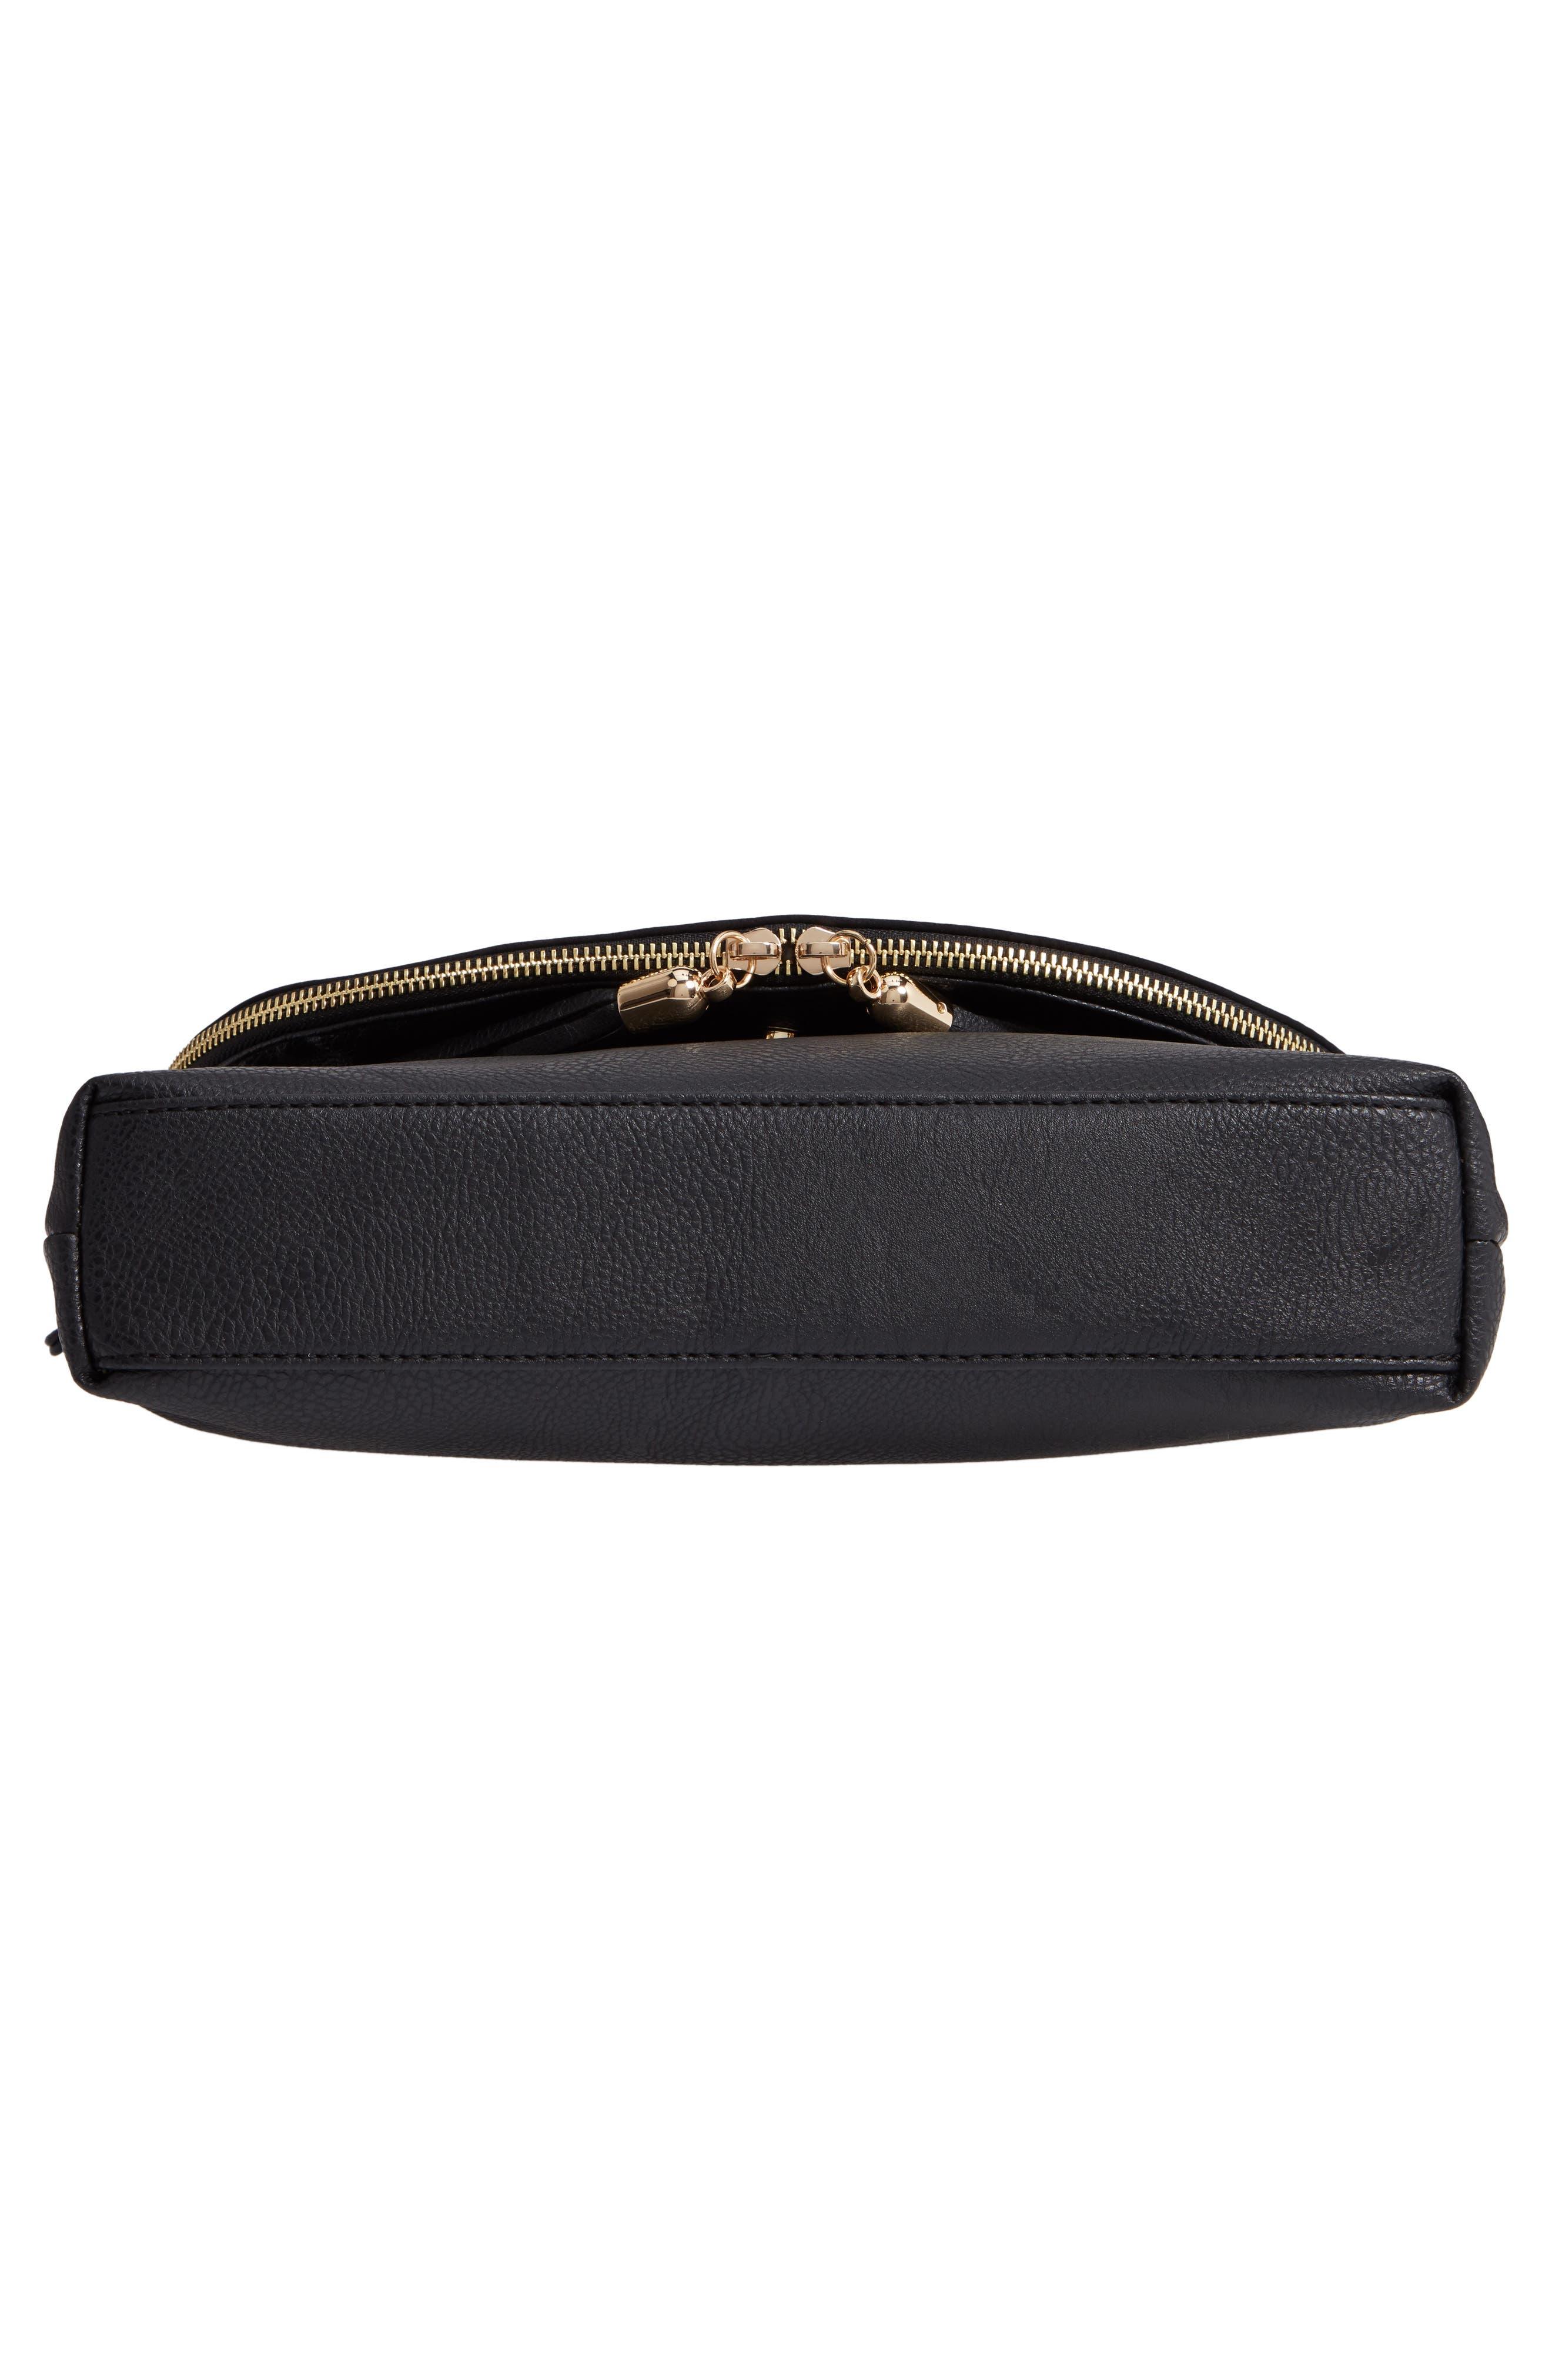 Faux Leather Foldover Tassel Crossbody Bag,                             Alternate thumbnail 6, color,                             BLACK